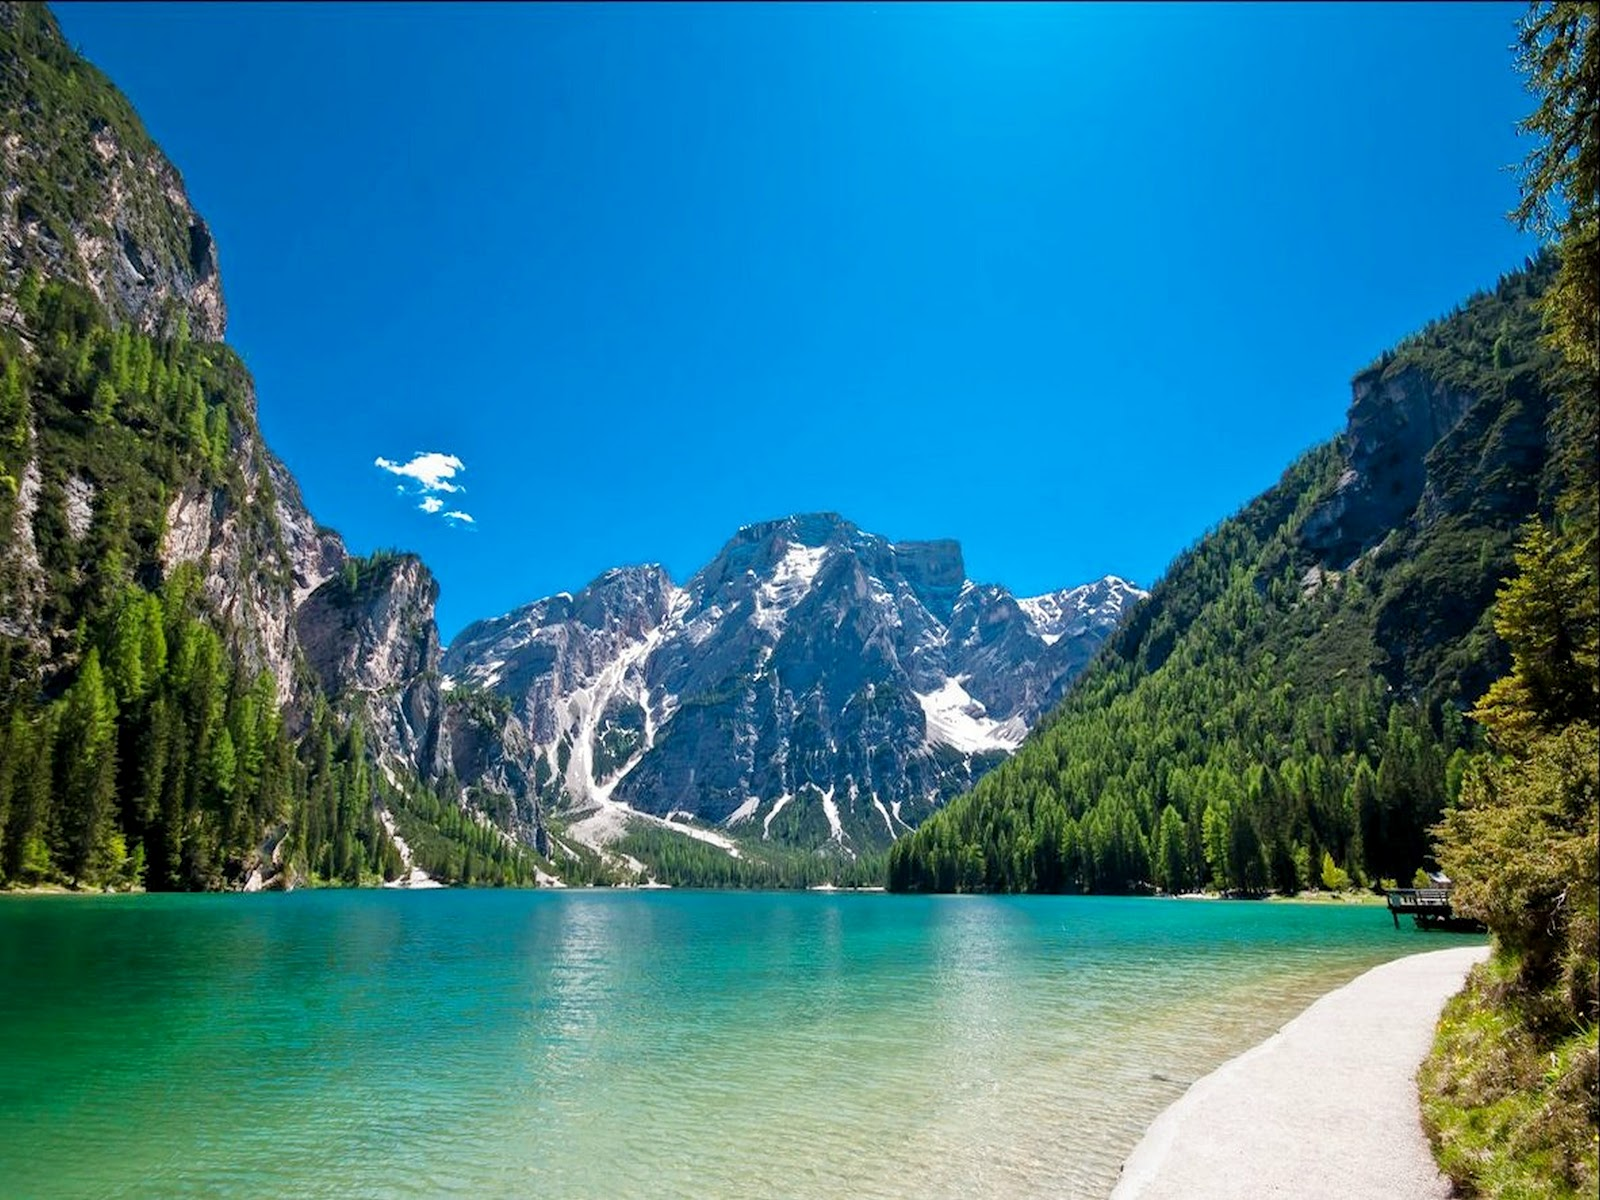 lago-di-braies-secret-world